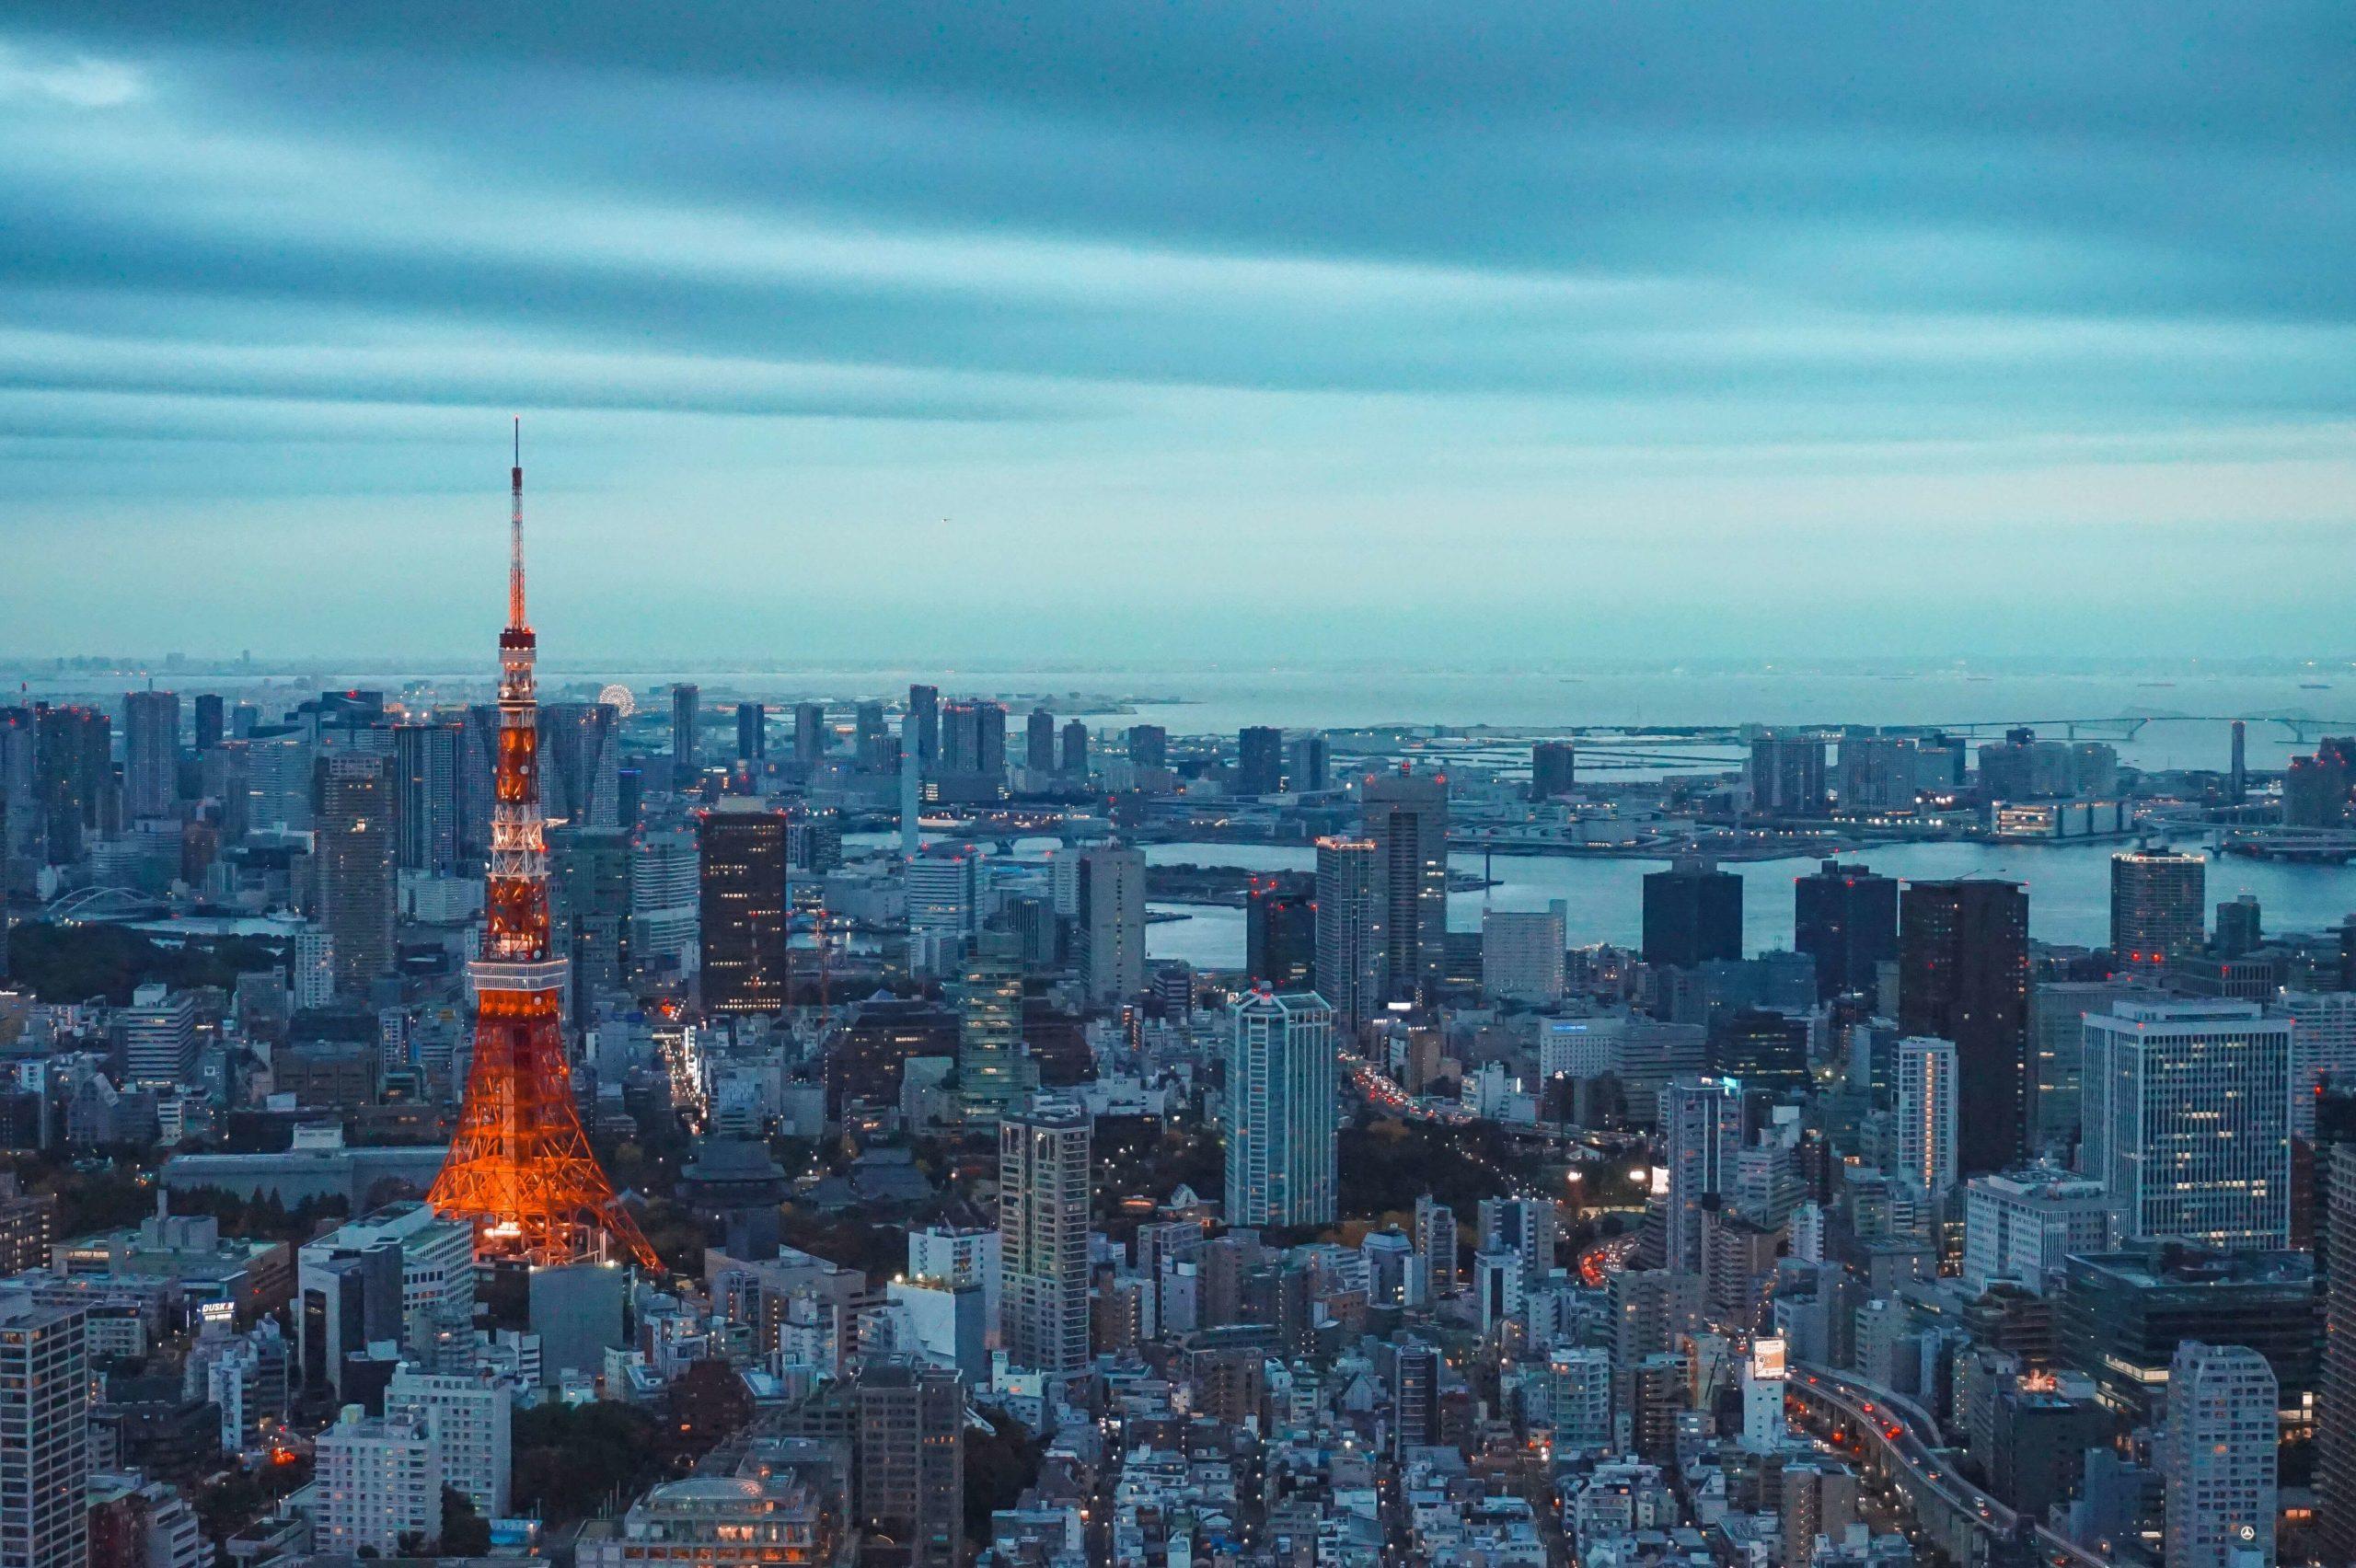 Vaundy 東京フラッシュ